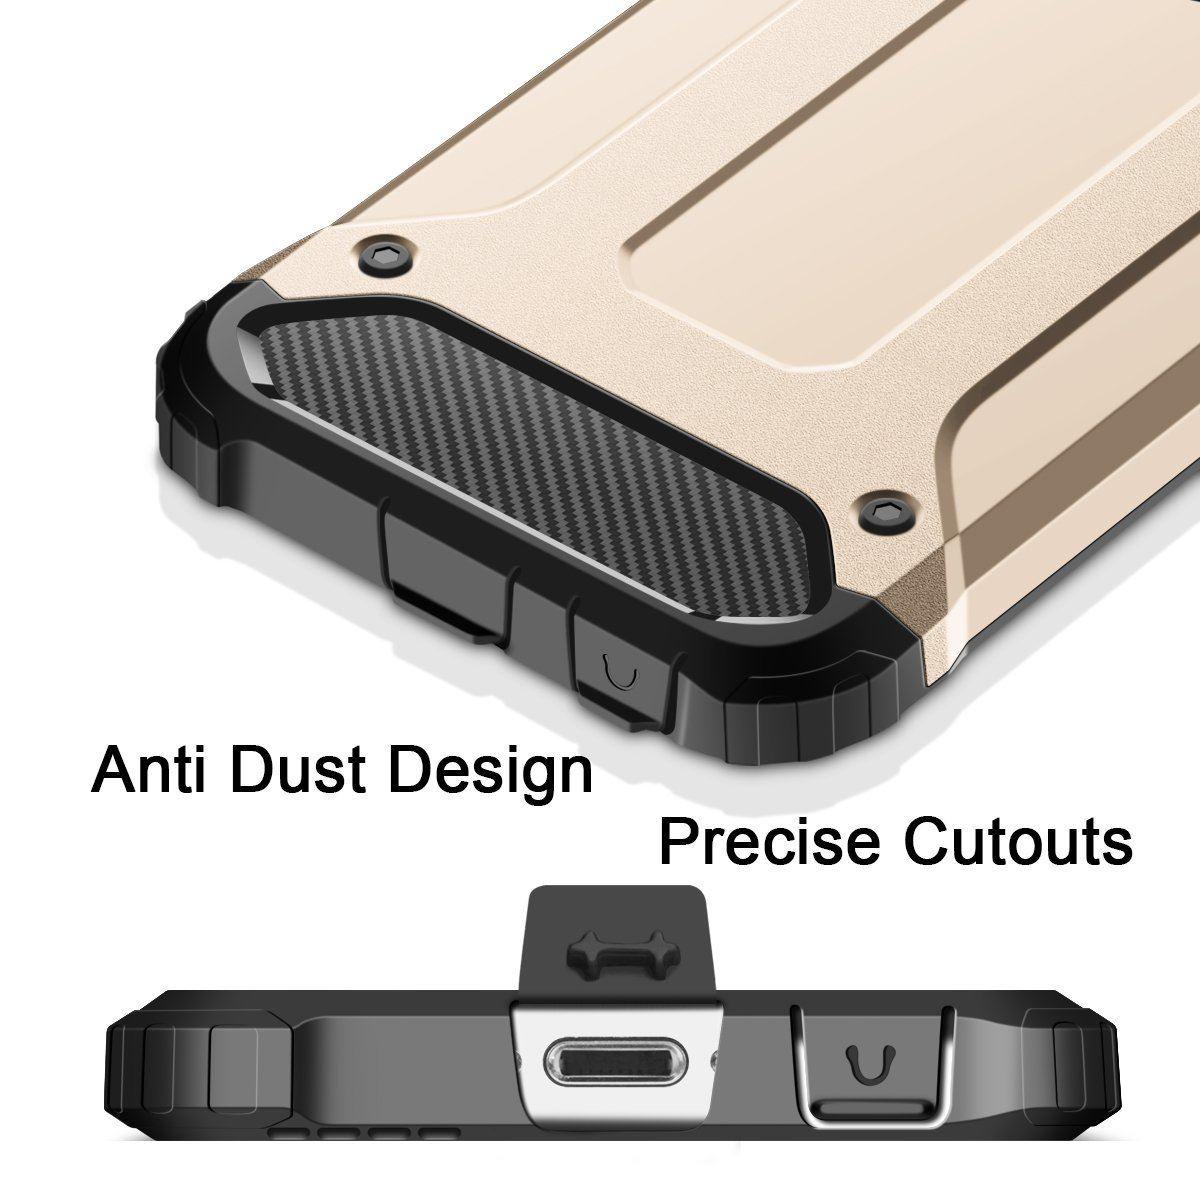 thumbnail 71 - For Apple iPhone 11 Pro Max XR Xs X 8 7 Plus 6 5 Se Case Cover Tough Armor